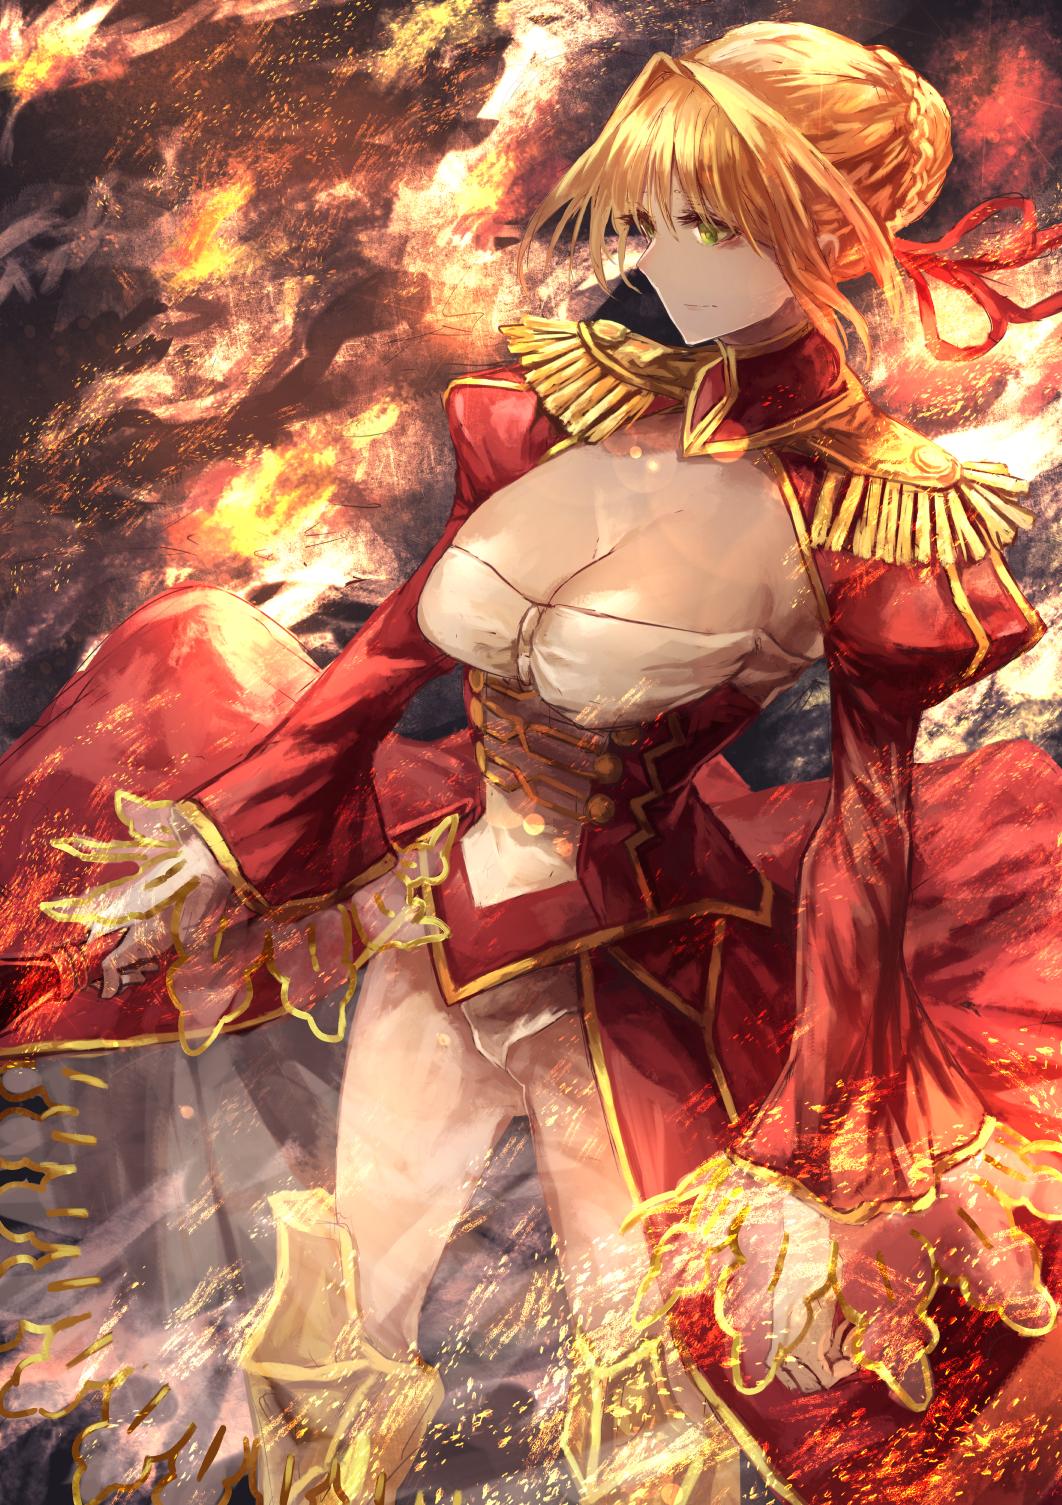 Cute Sakura Wallpaper Wallpaper Signo Aaa Fate Series Fate Grand Order Nero